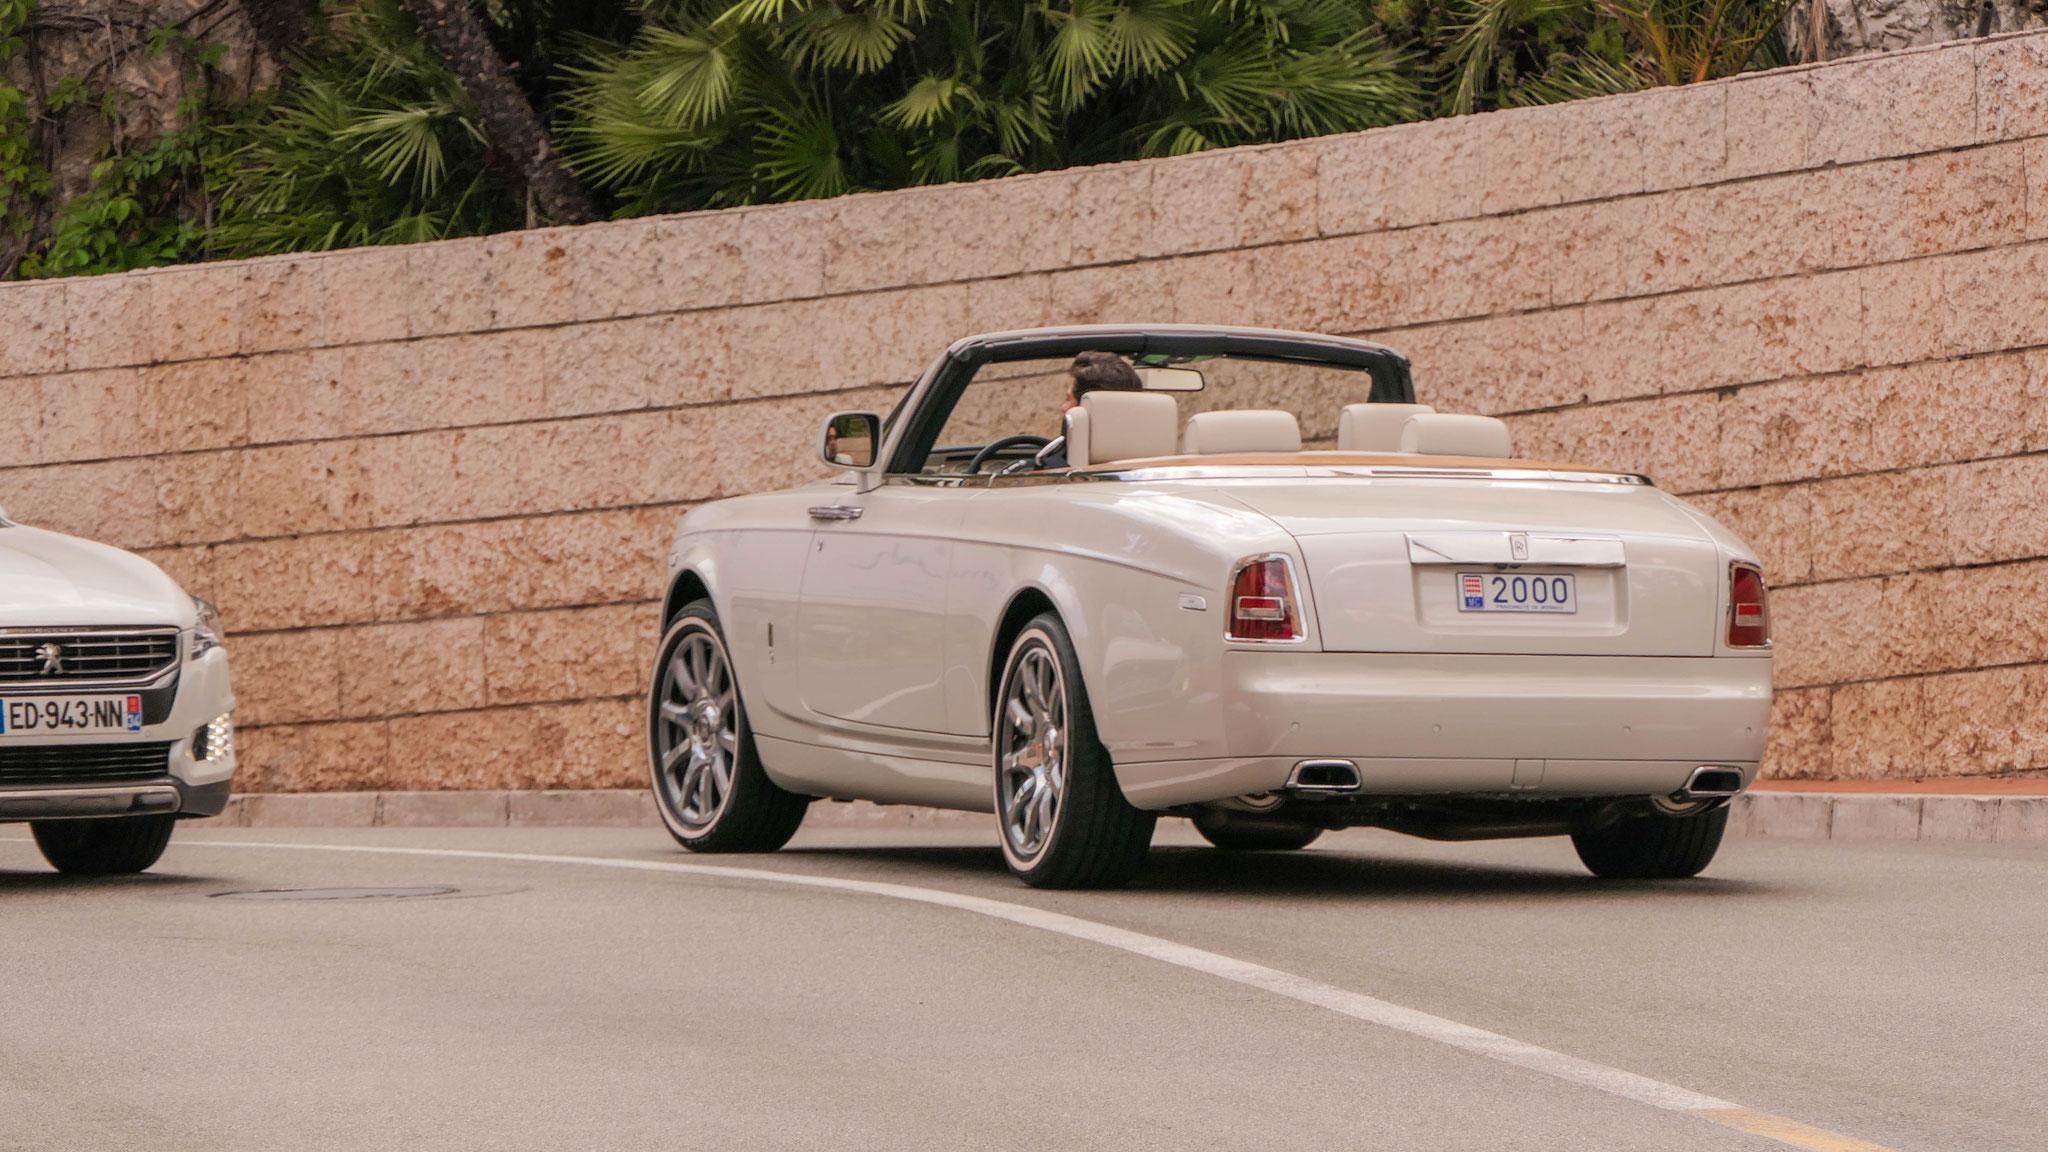 Rolls Royce Drophead - 2000 (MC)